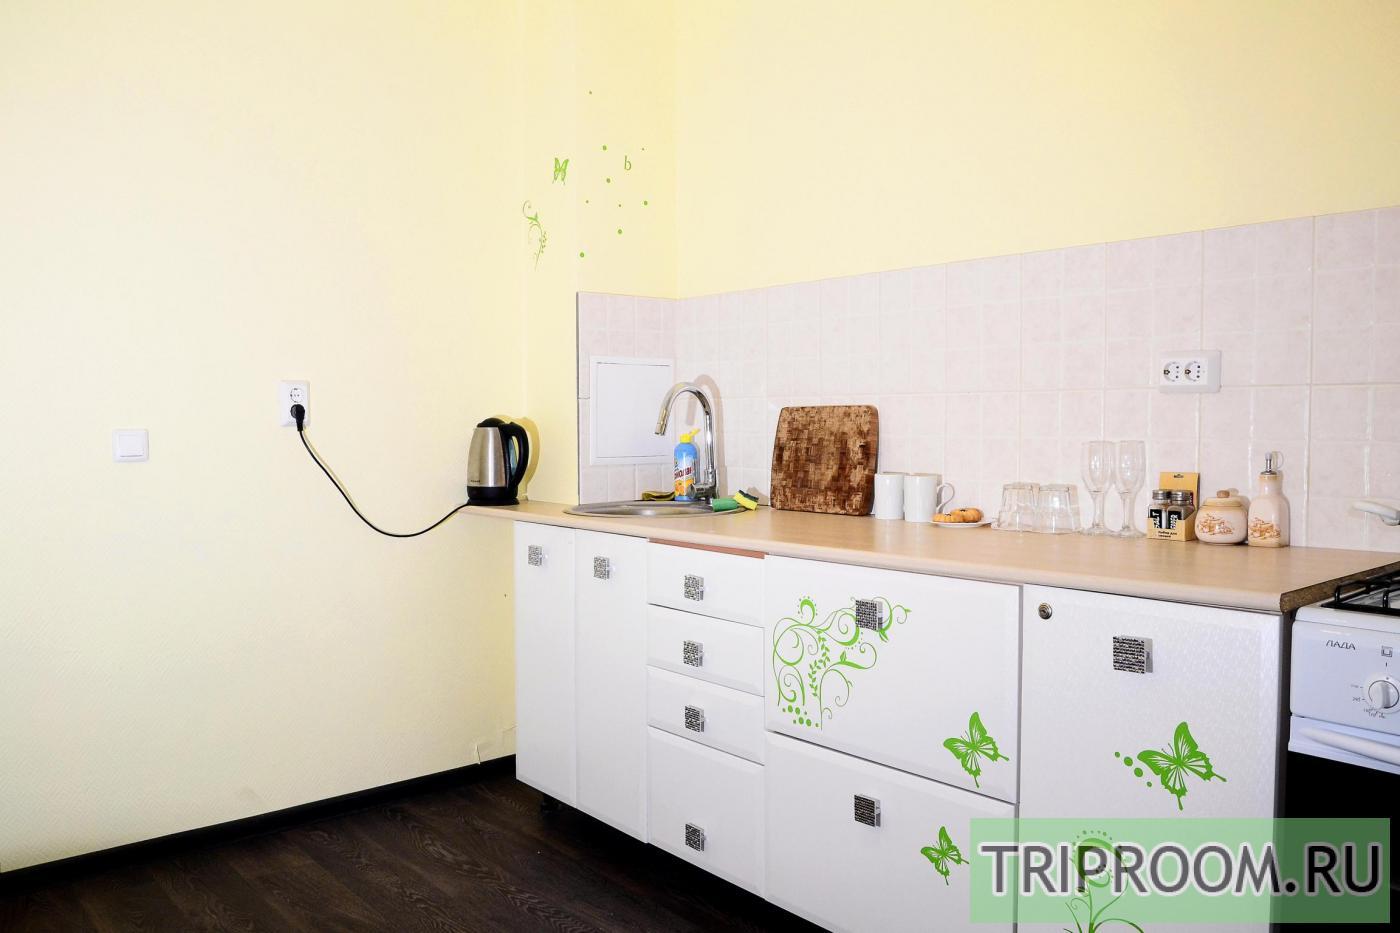 1-комнатная квартира посуточно (вариант № 14713), ул. Петра Смородина улица, фото № 8